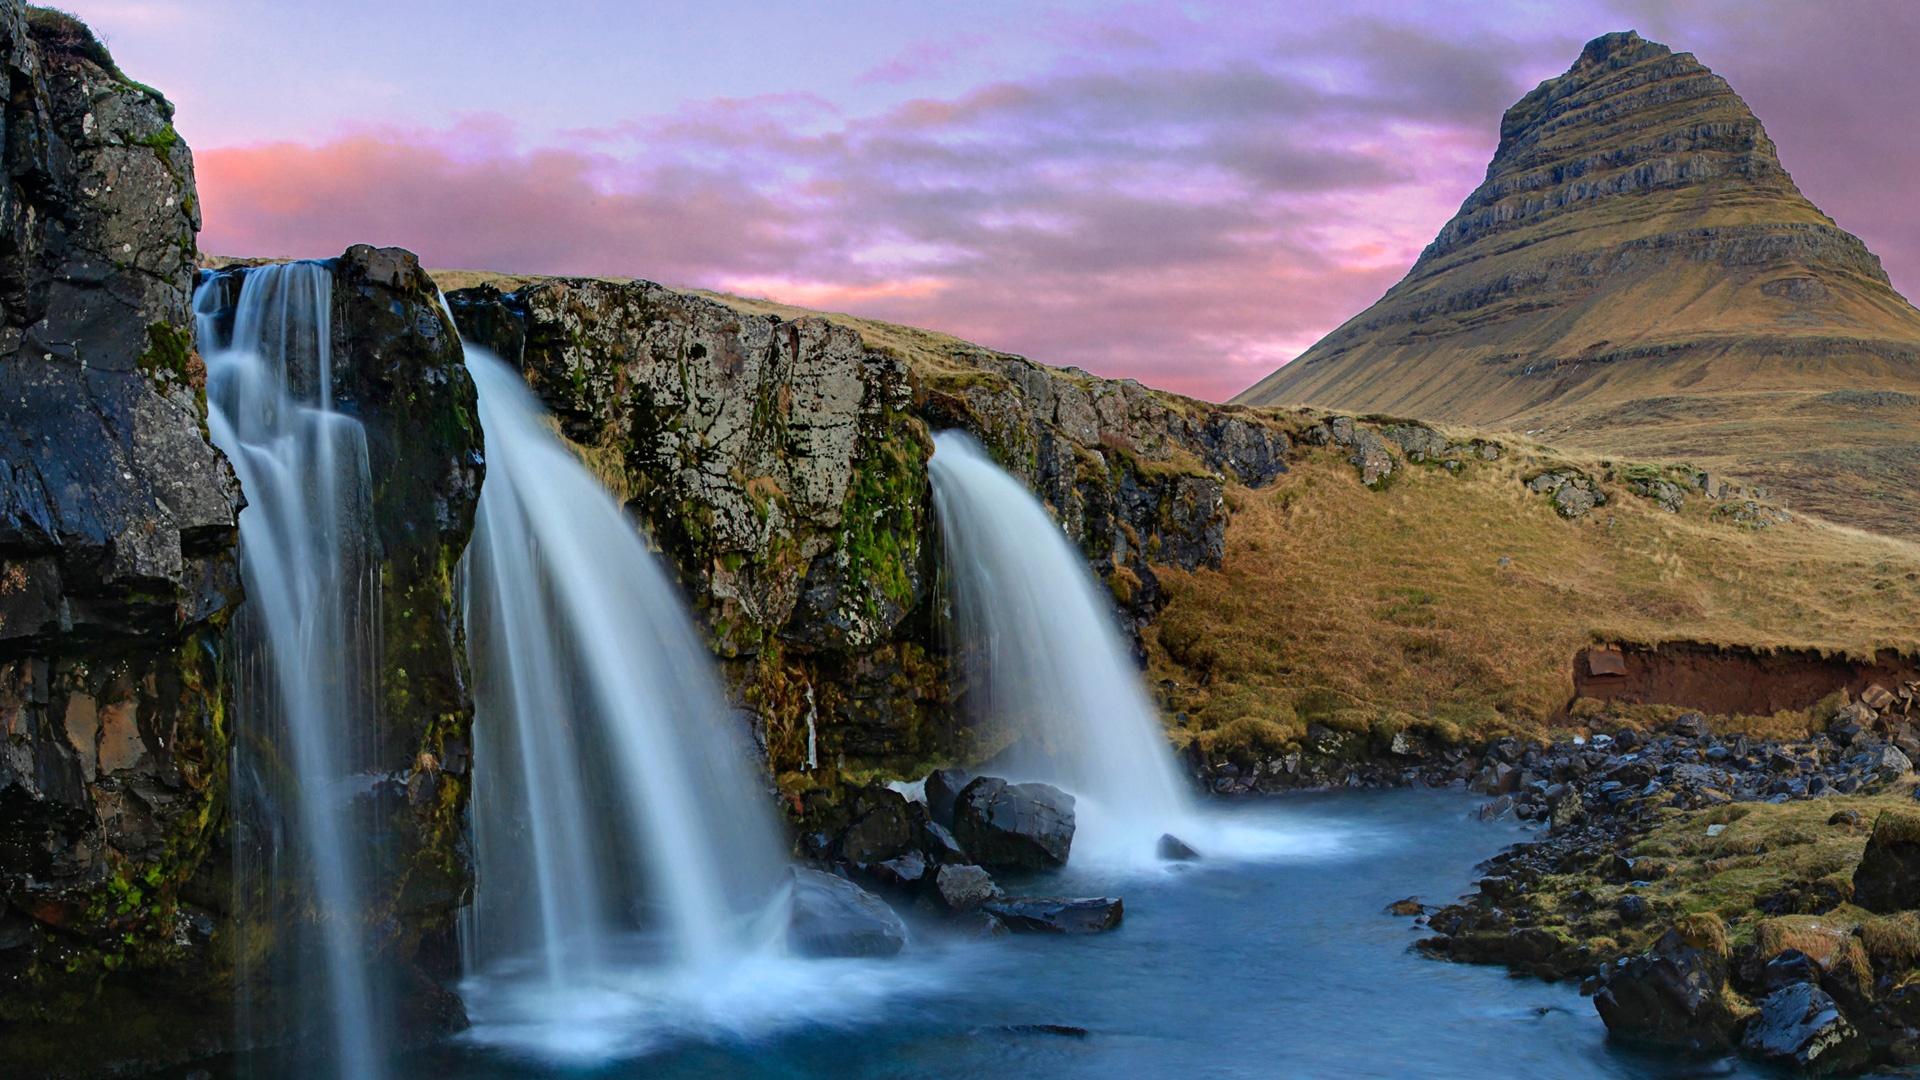 Animated Waterfalls Wallpapers Free Download Kirkjufell Mountain Waterfalls Iceland Wallpapers In Jpg